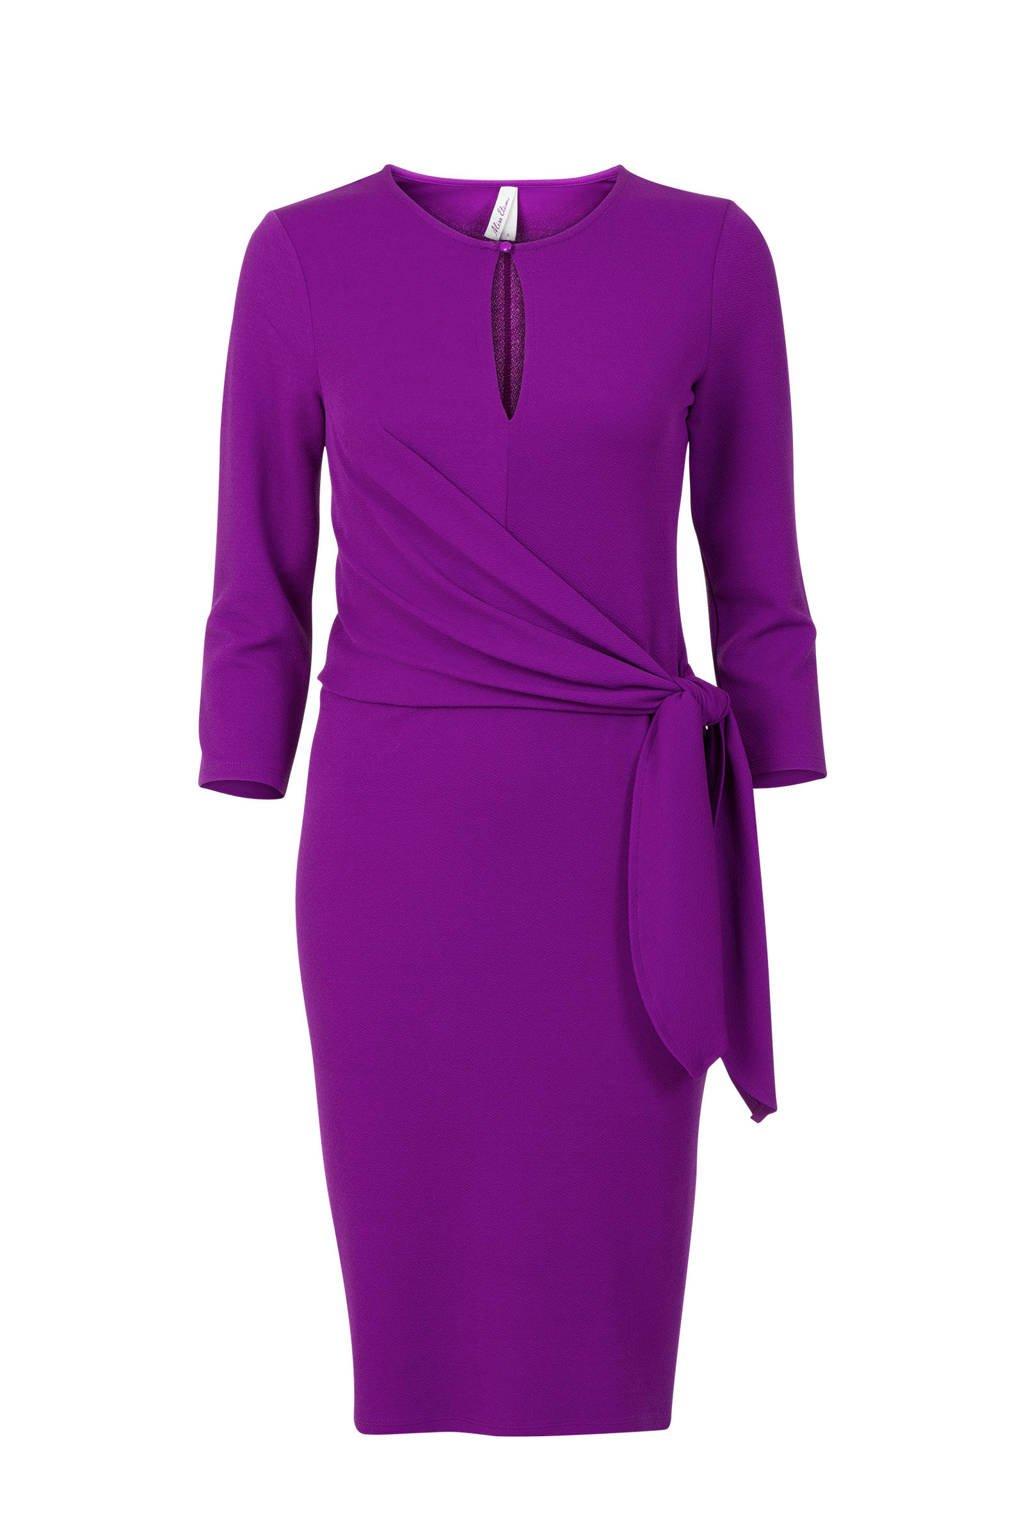 Miss Etam Regulier jurk lila, Paars